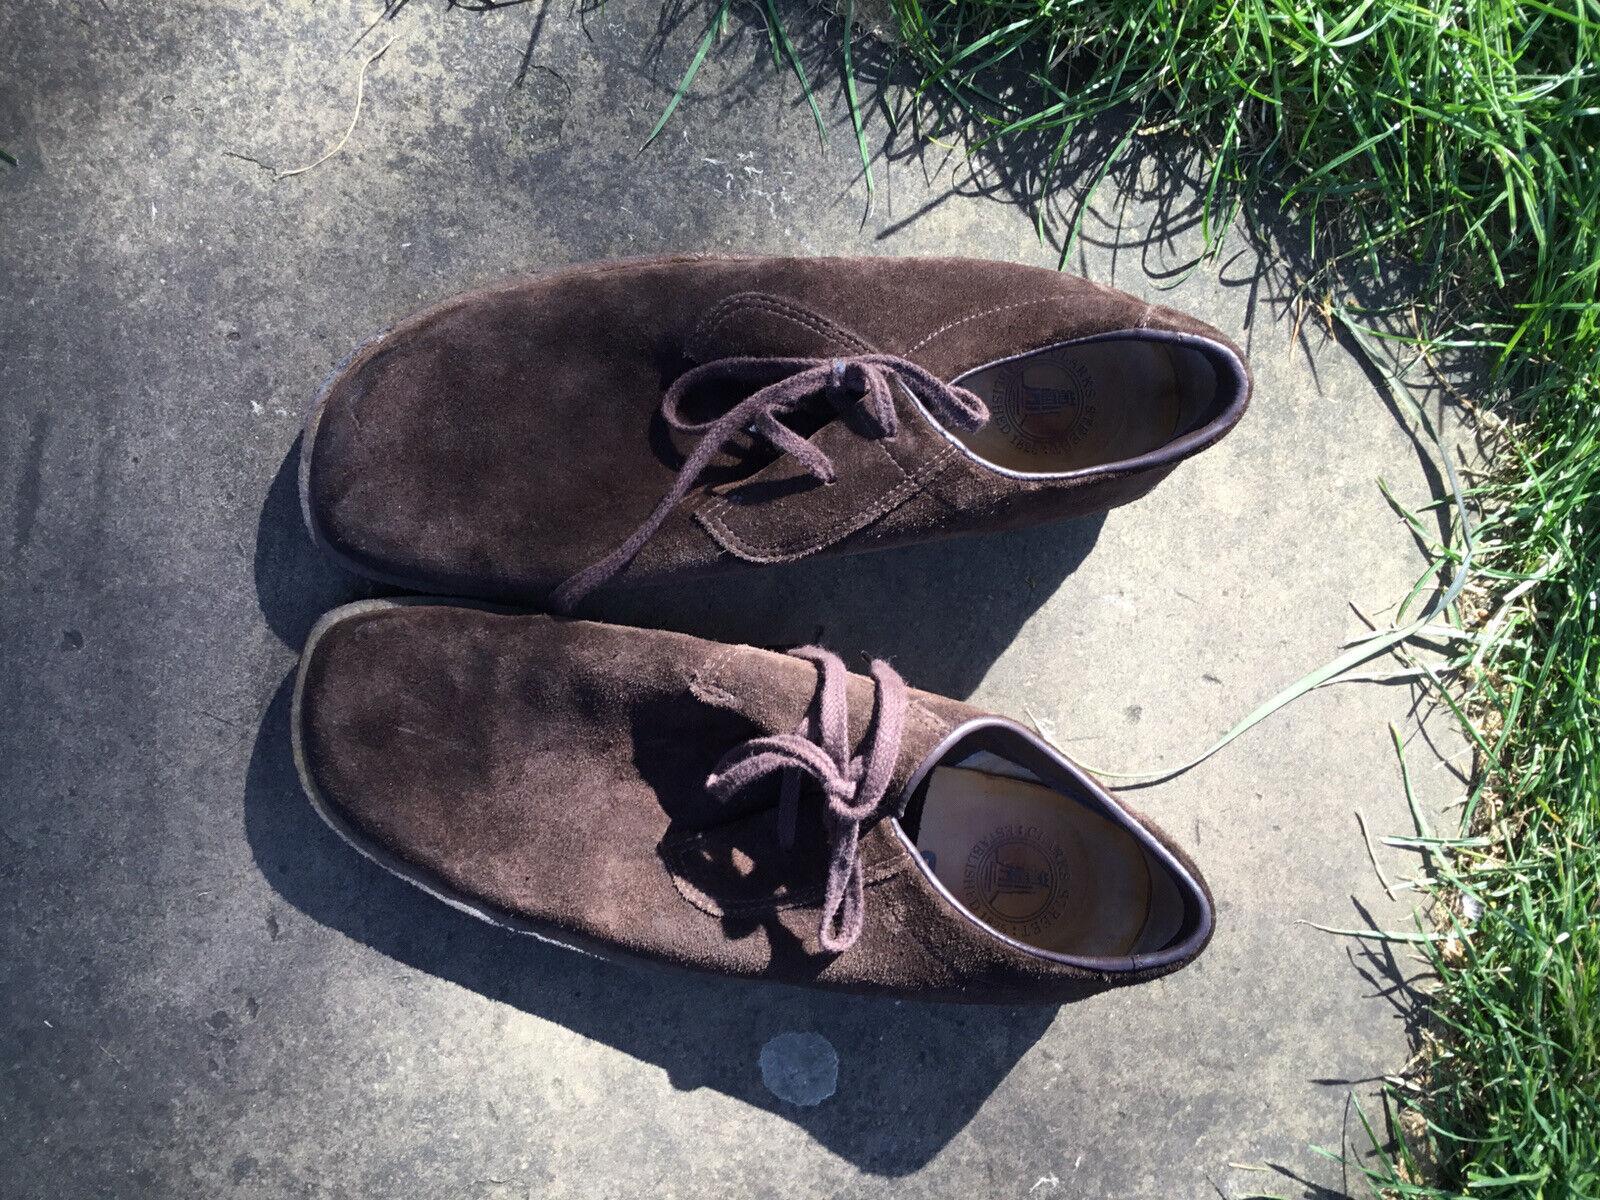 clarks originals - Chocolate Brown Suede size 9G Crepe Soled Desert Shoe